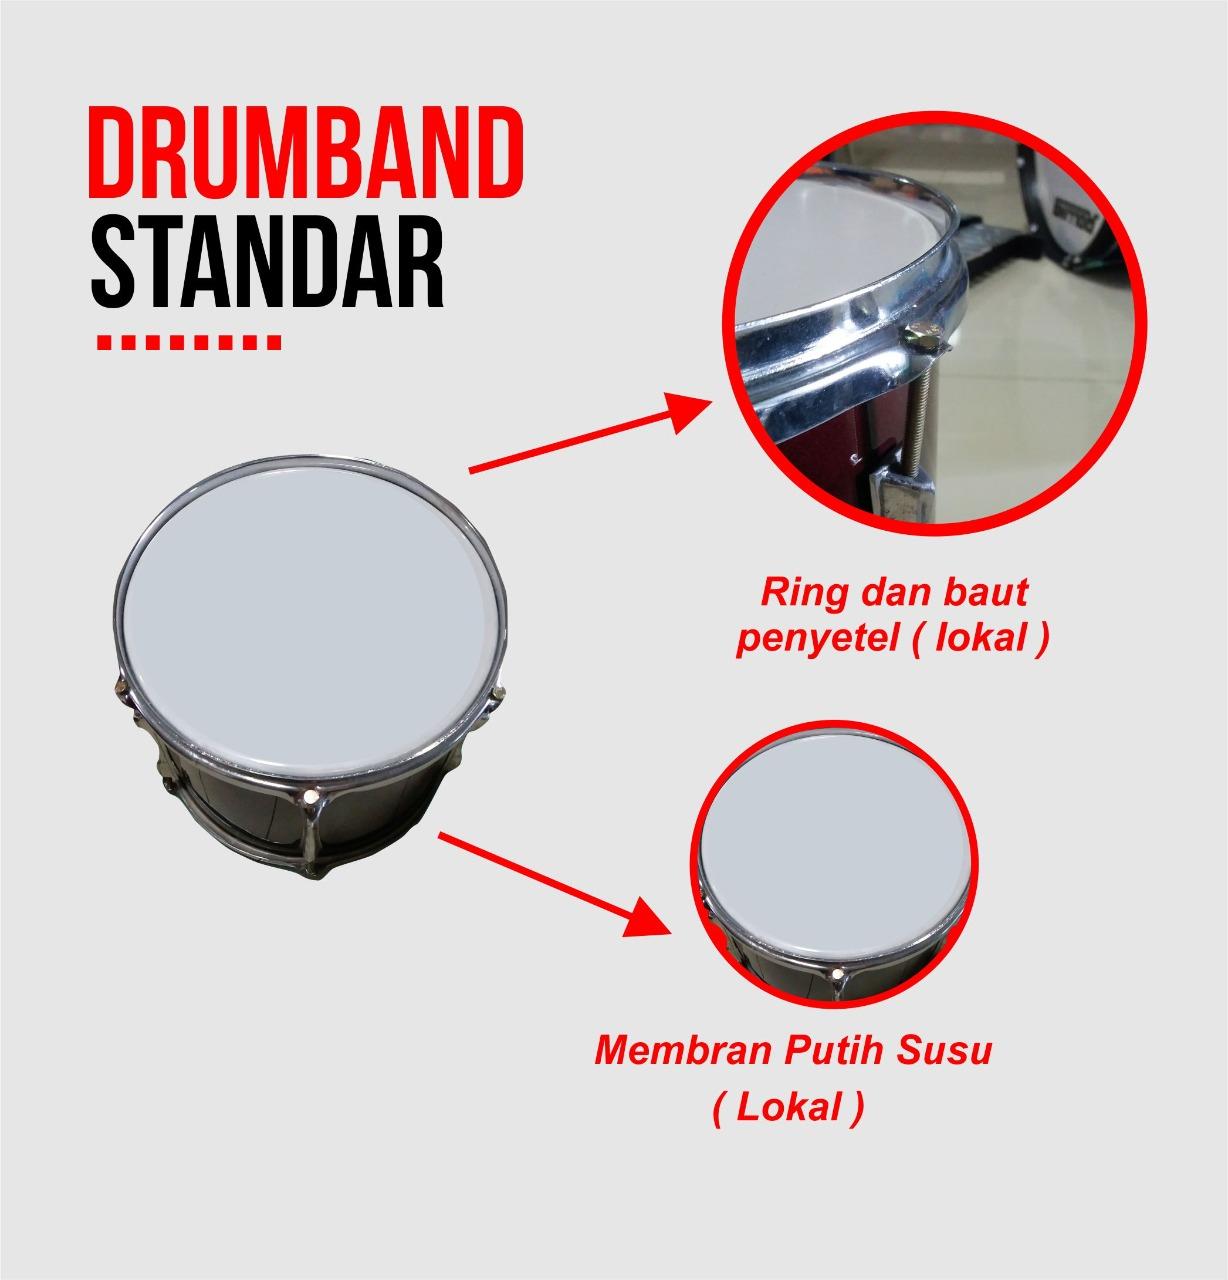 harga drumband standar